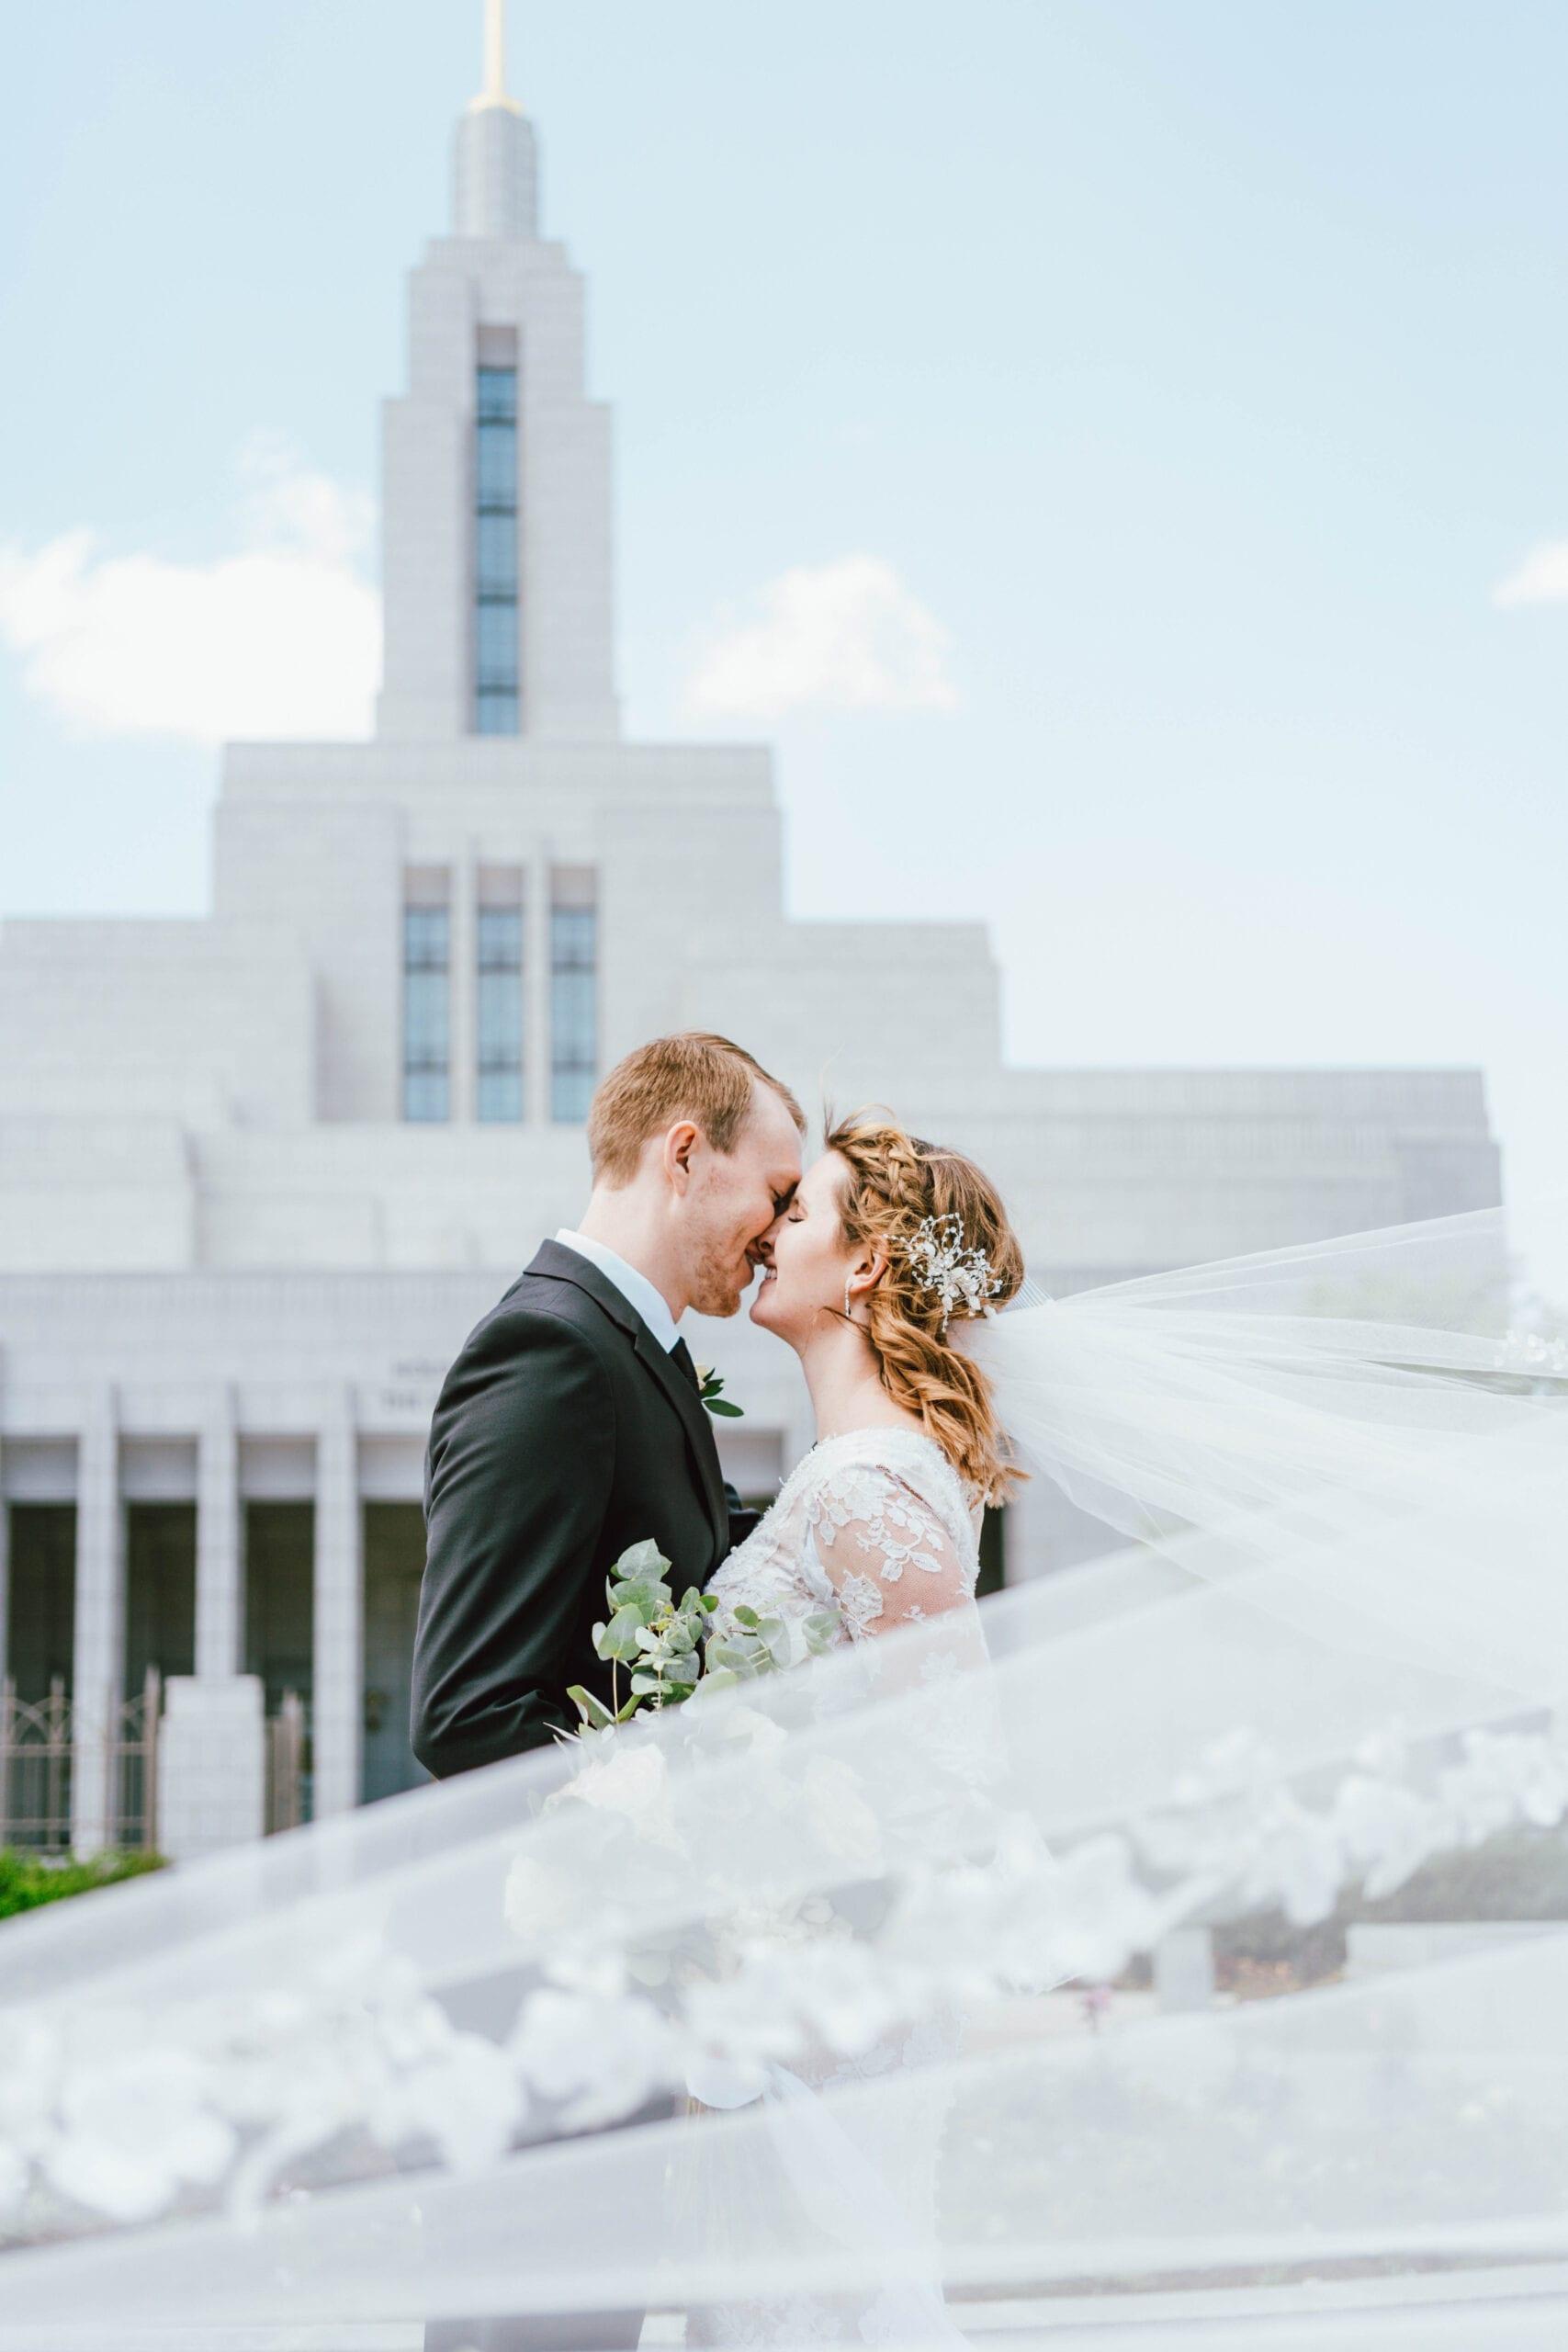 draper utah temple wedding award winning picture